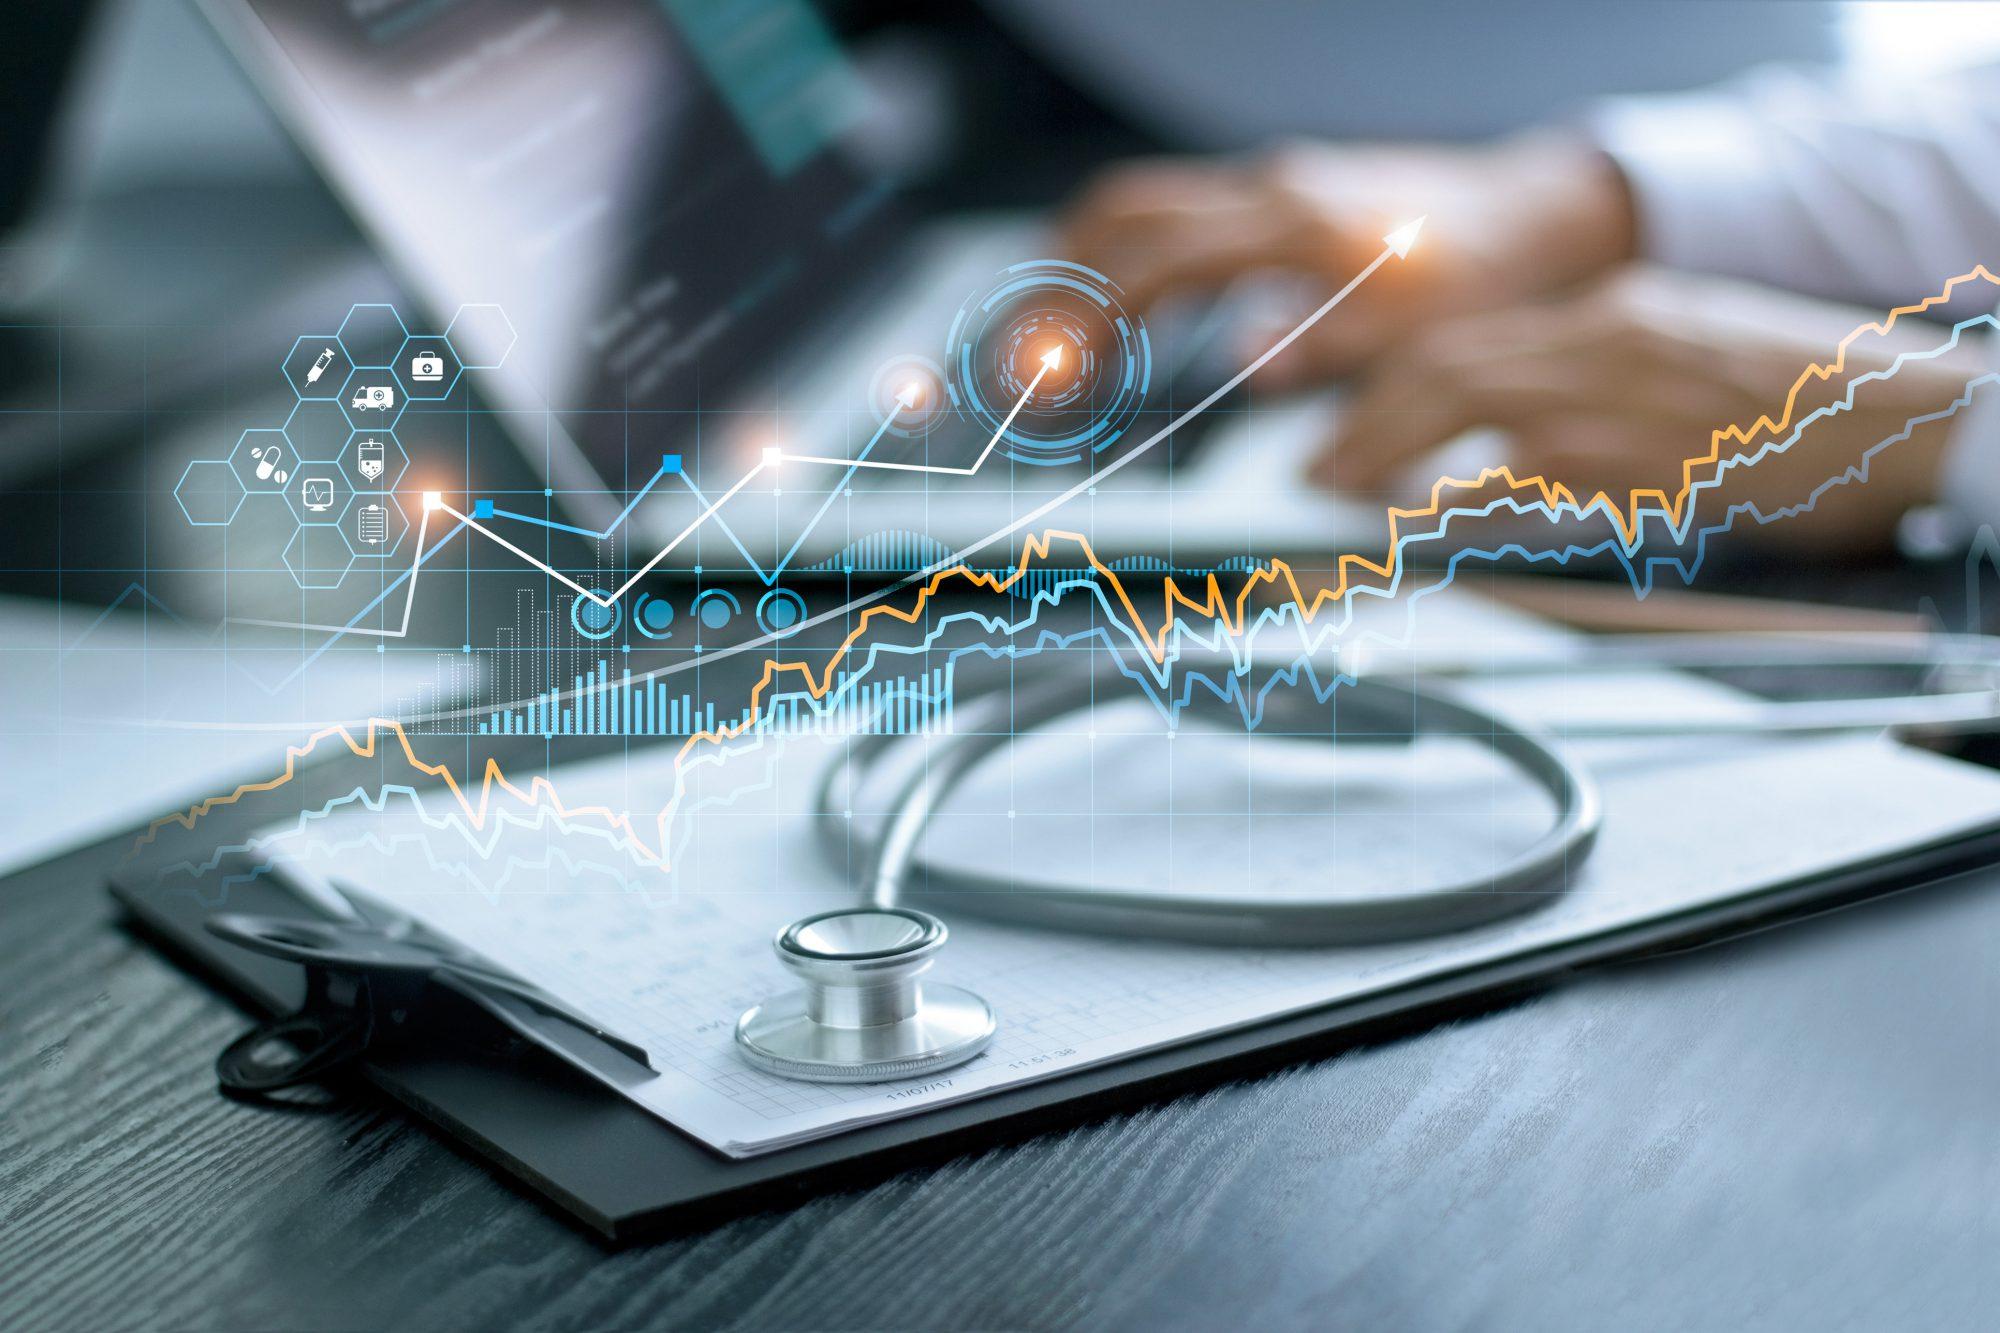 Cyber Liability and HIPAA Compliance